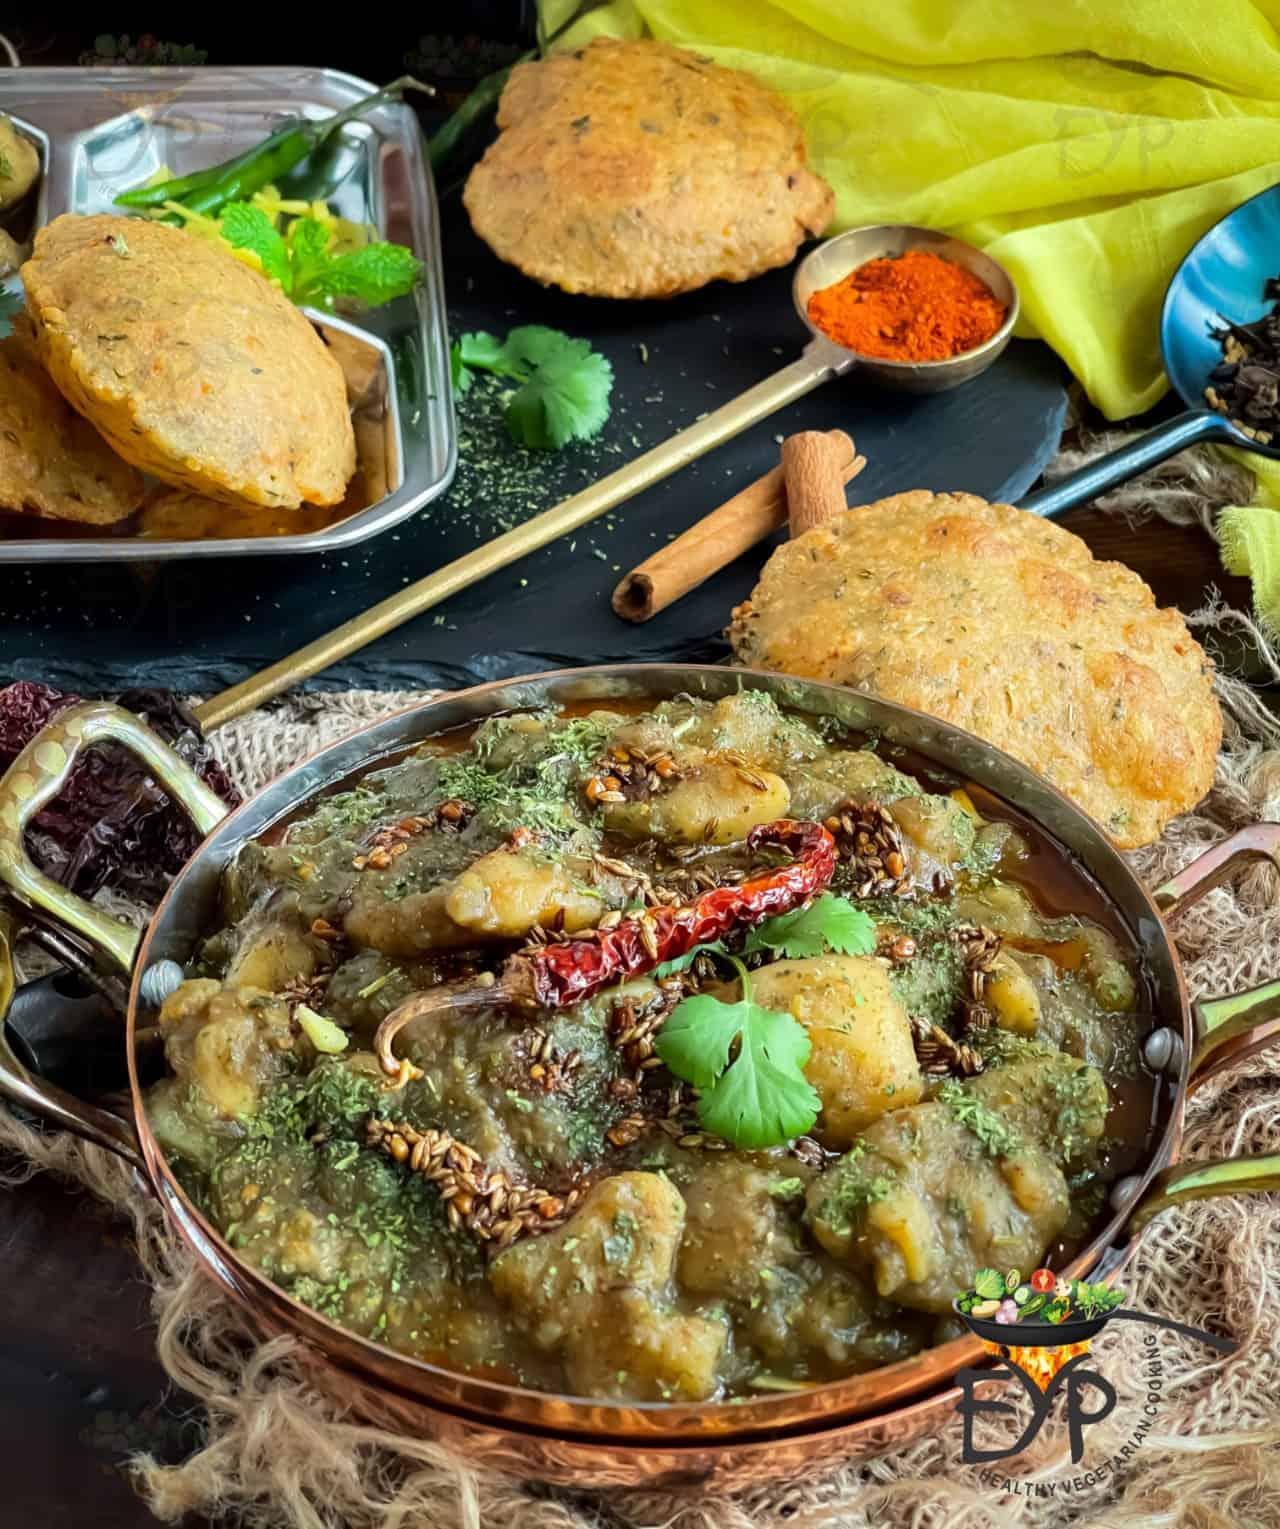 Dubki wale aloo served in a copper wok